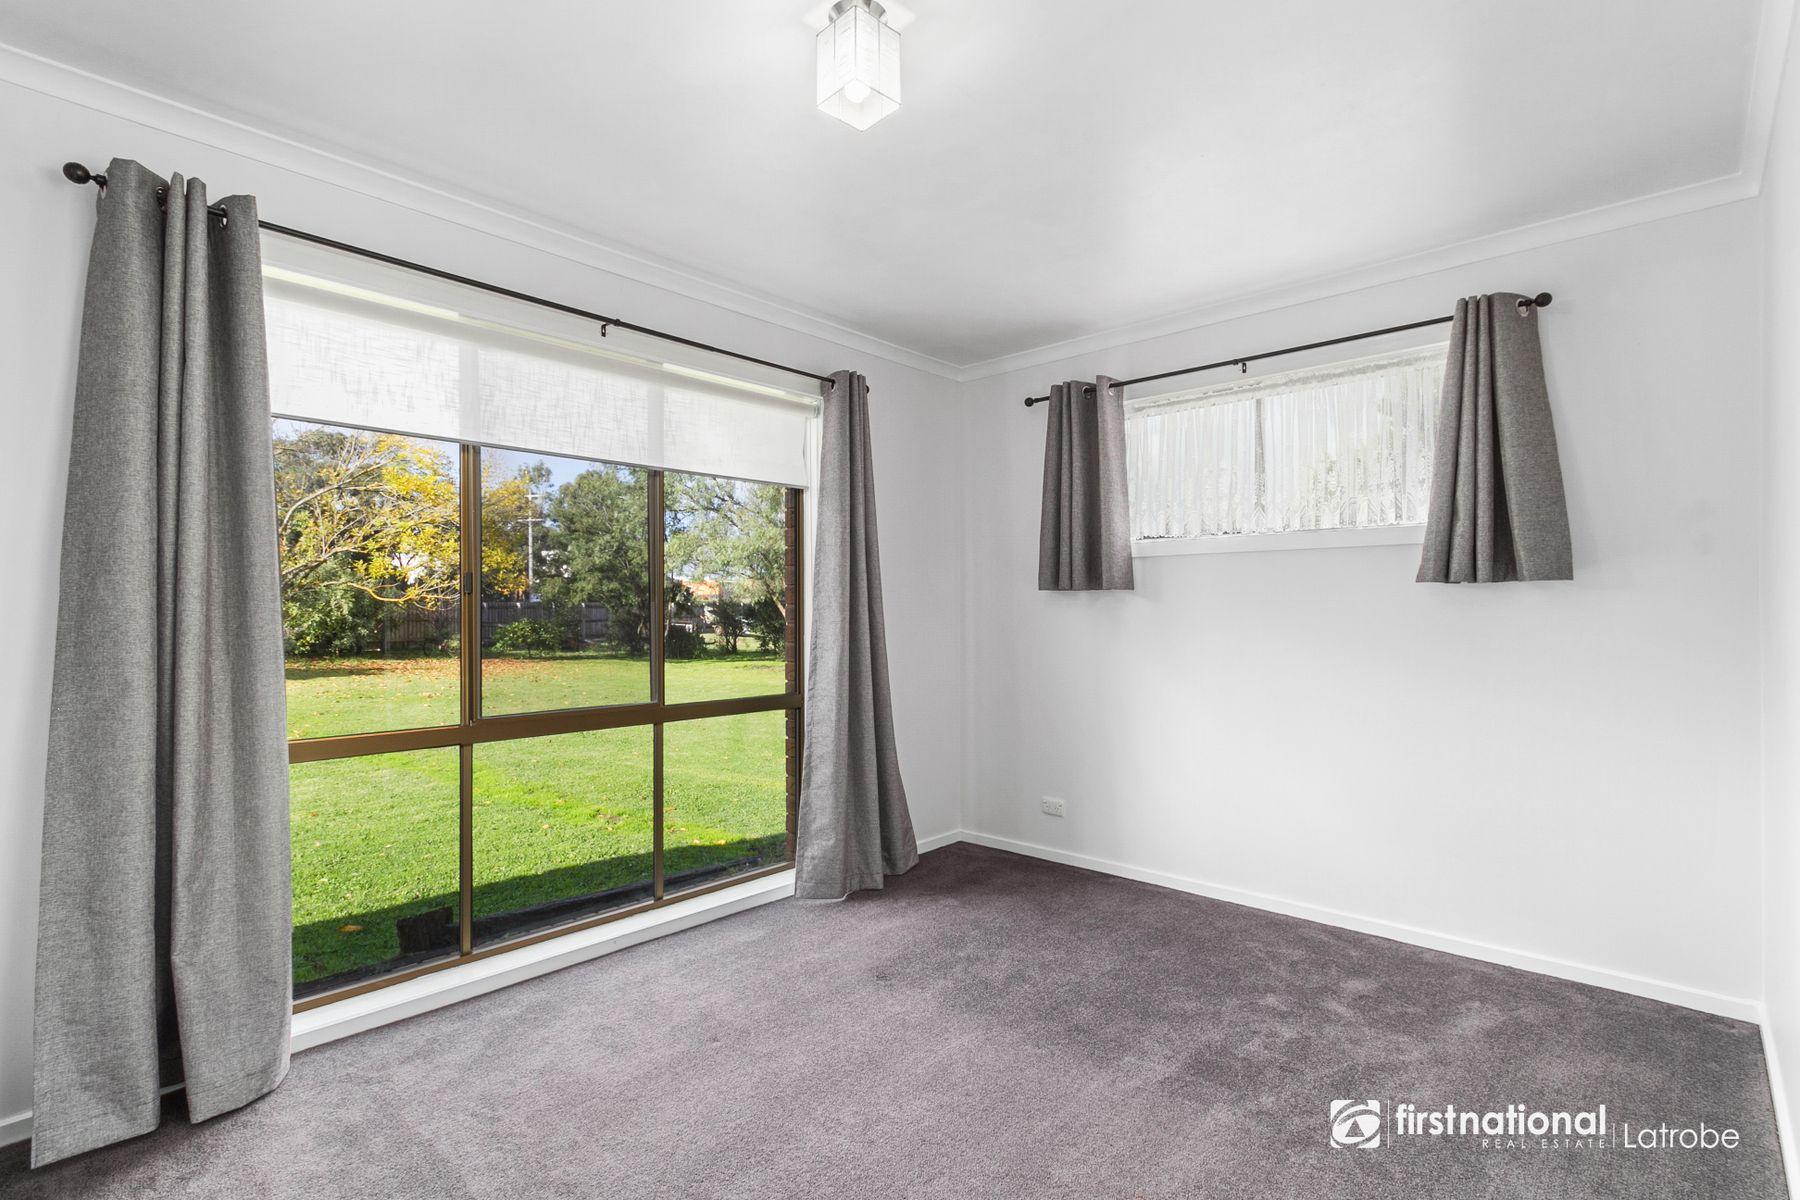 2 Edward Place, Traralgon, VIC 3844